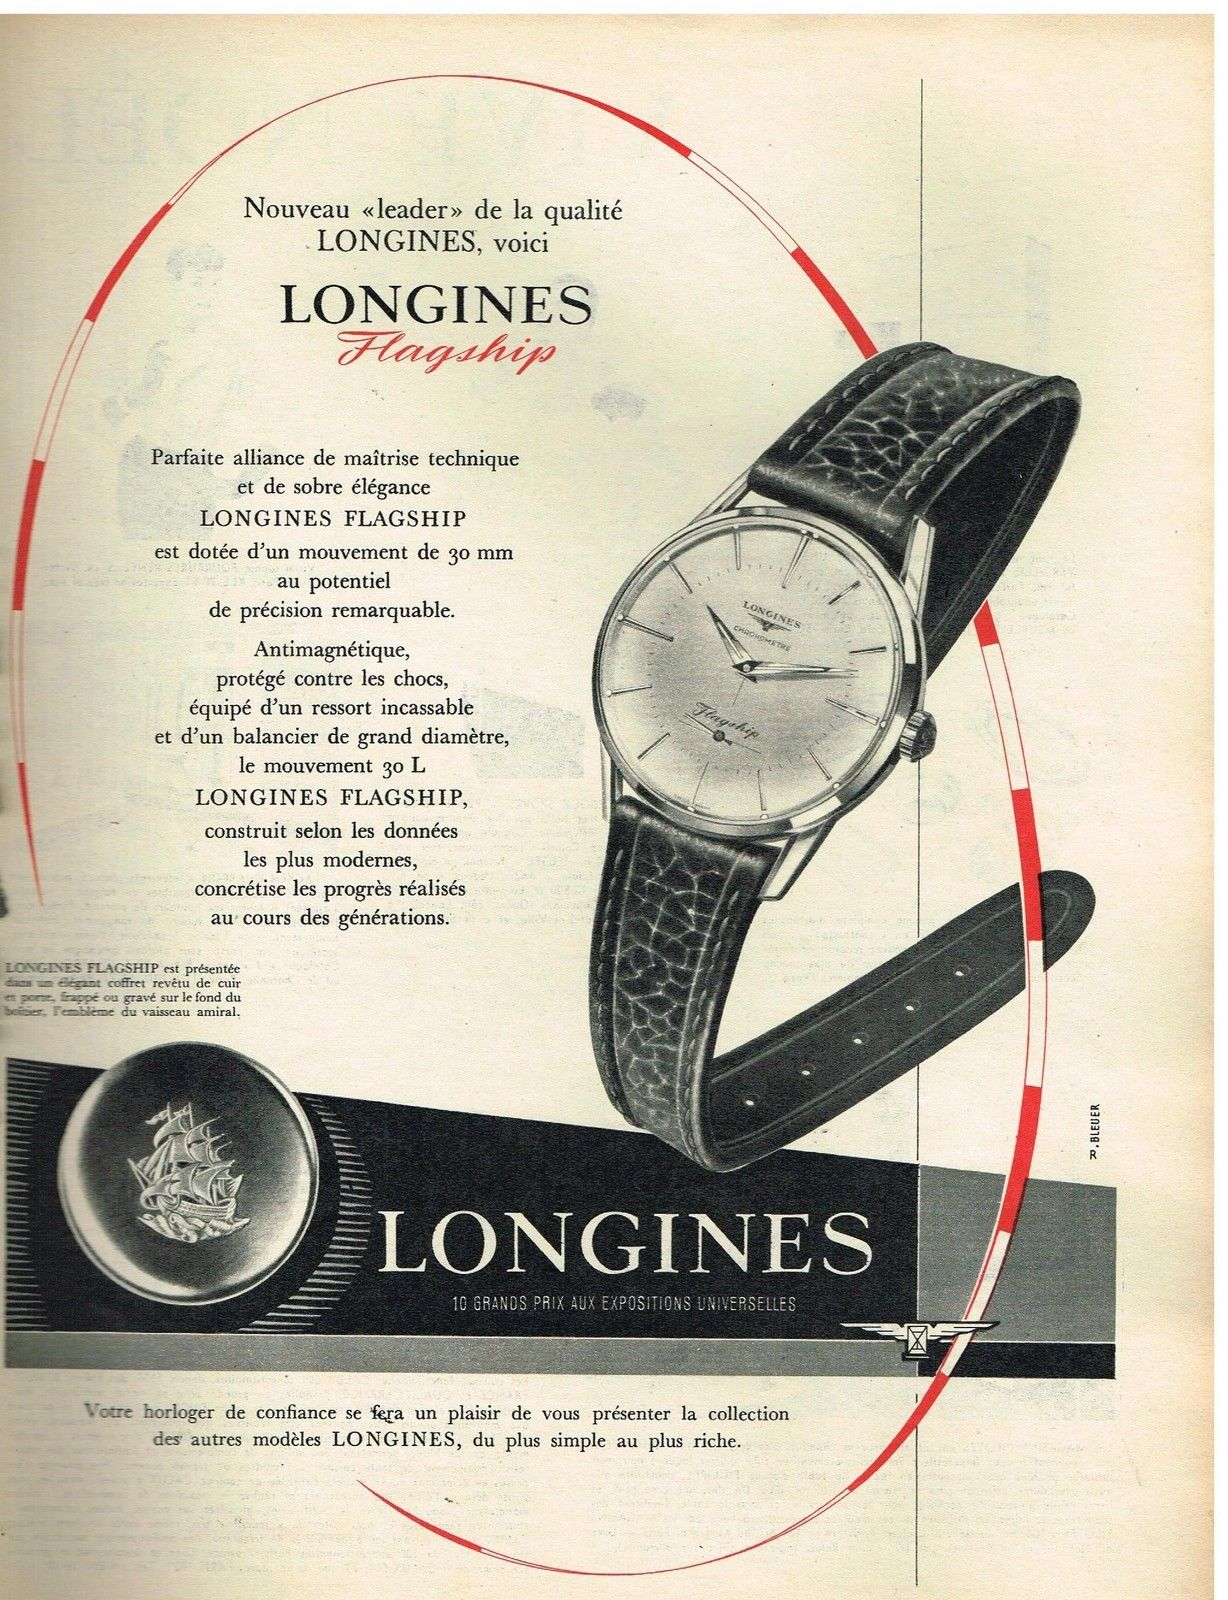 Publicidad Longines Flagship 1957